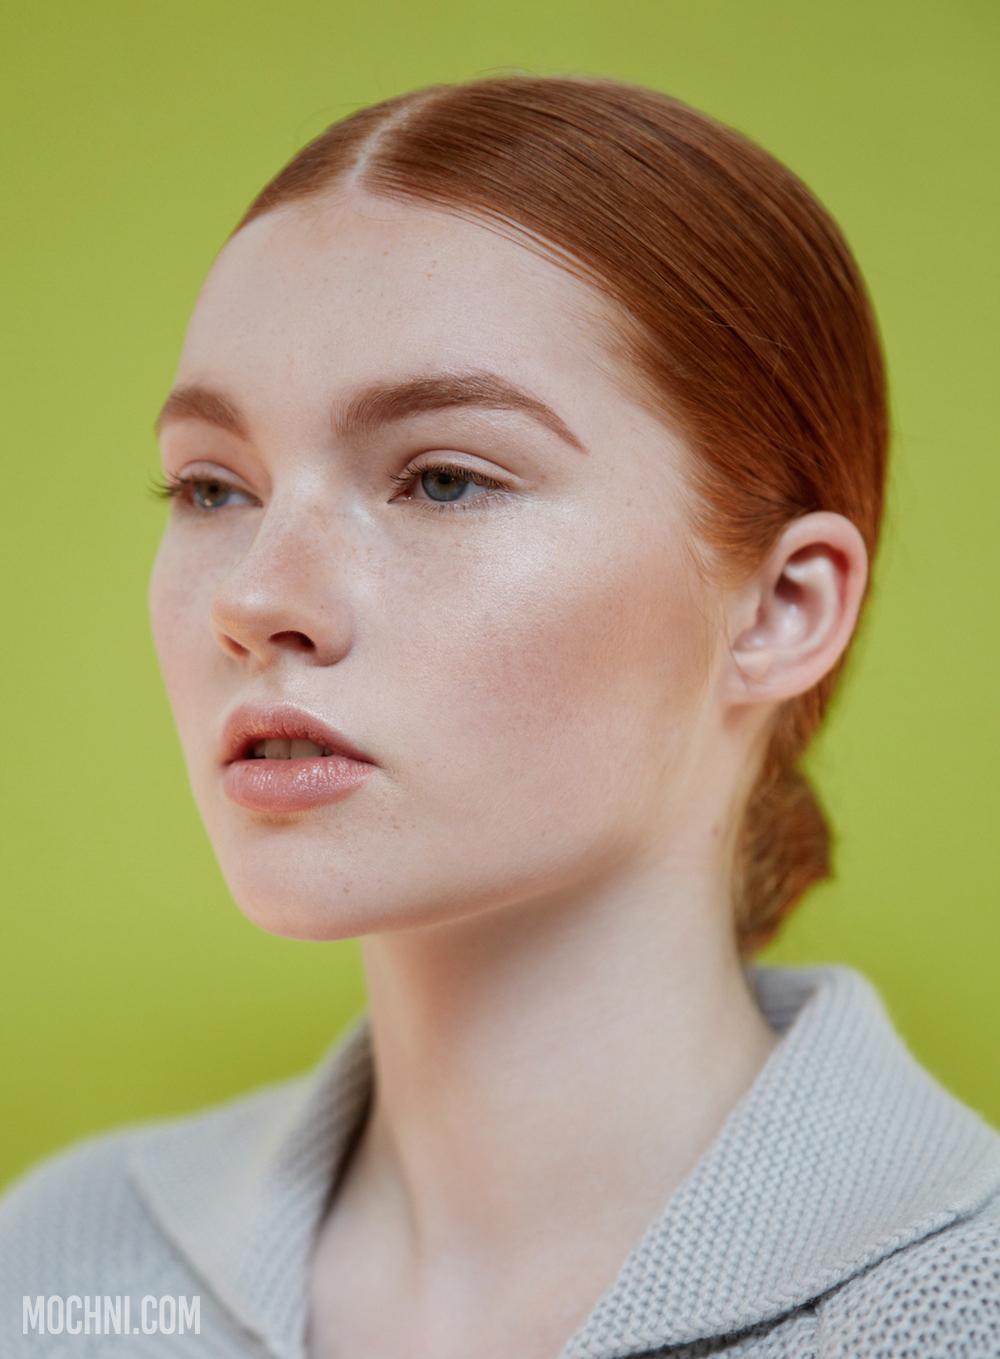 How To Create The No-Makeup Makeup Look